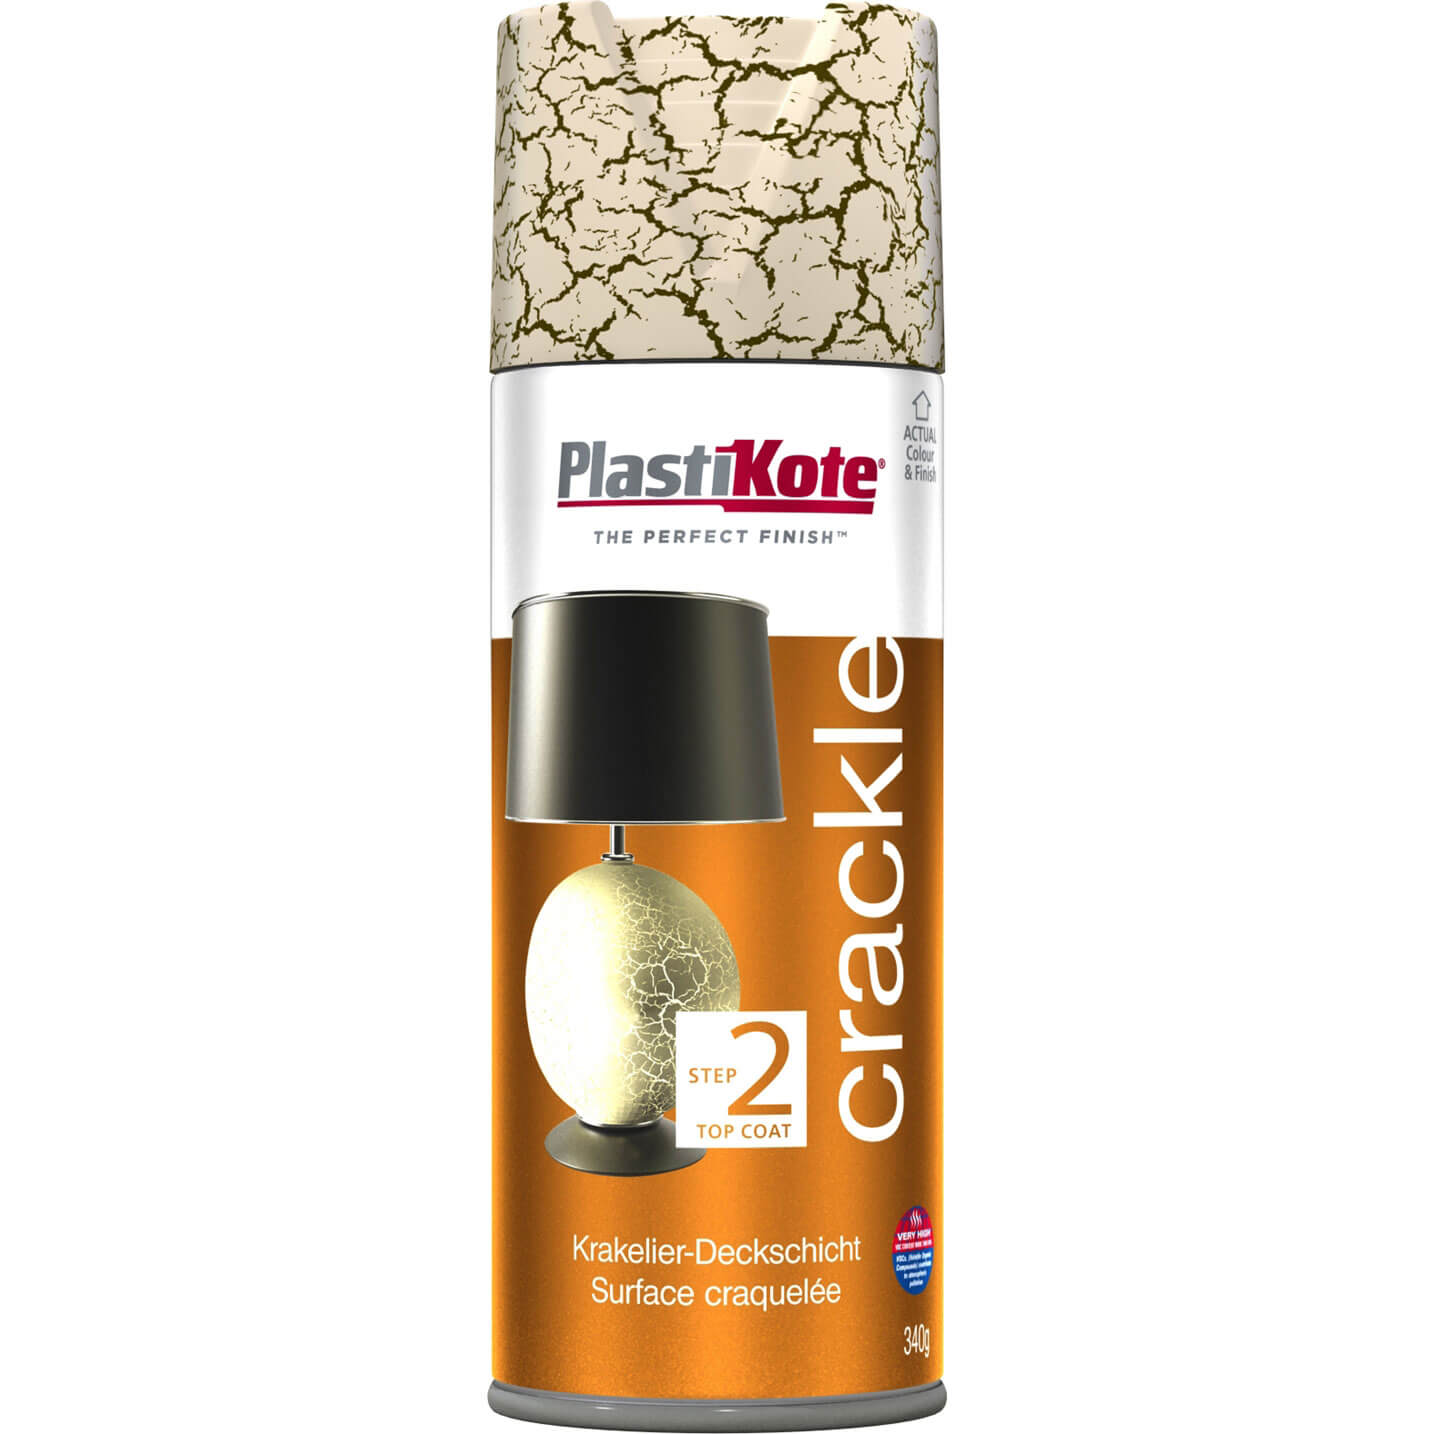 plastikote crackle touch aerosol spray paint. Black Bedroom Furniture Sets. Home Design Ideas